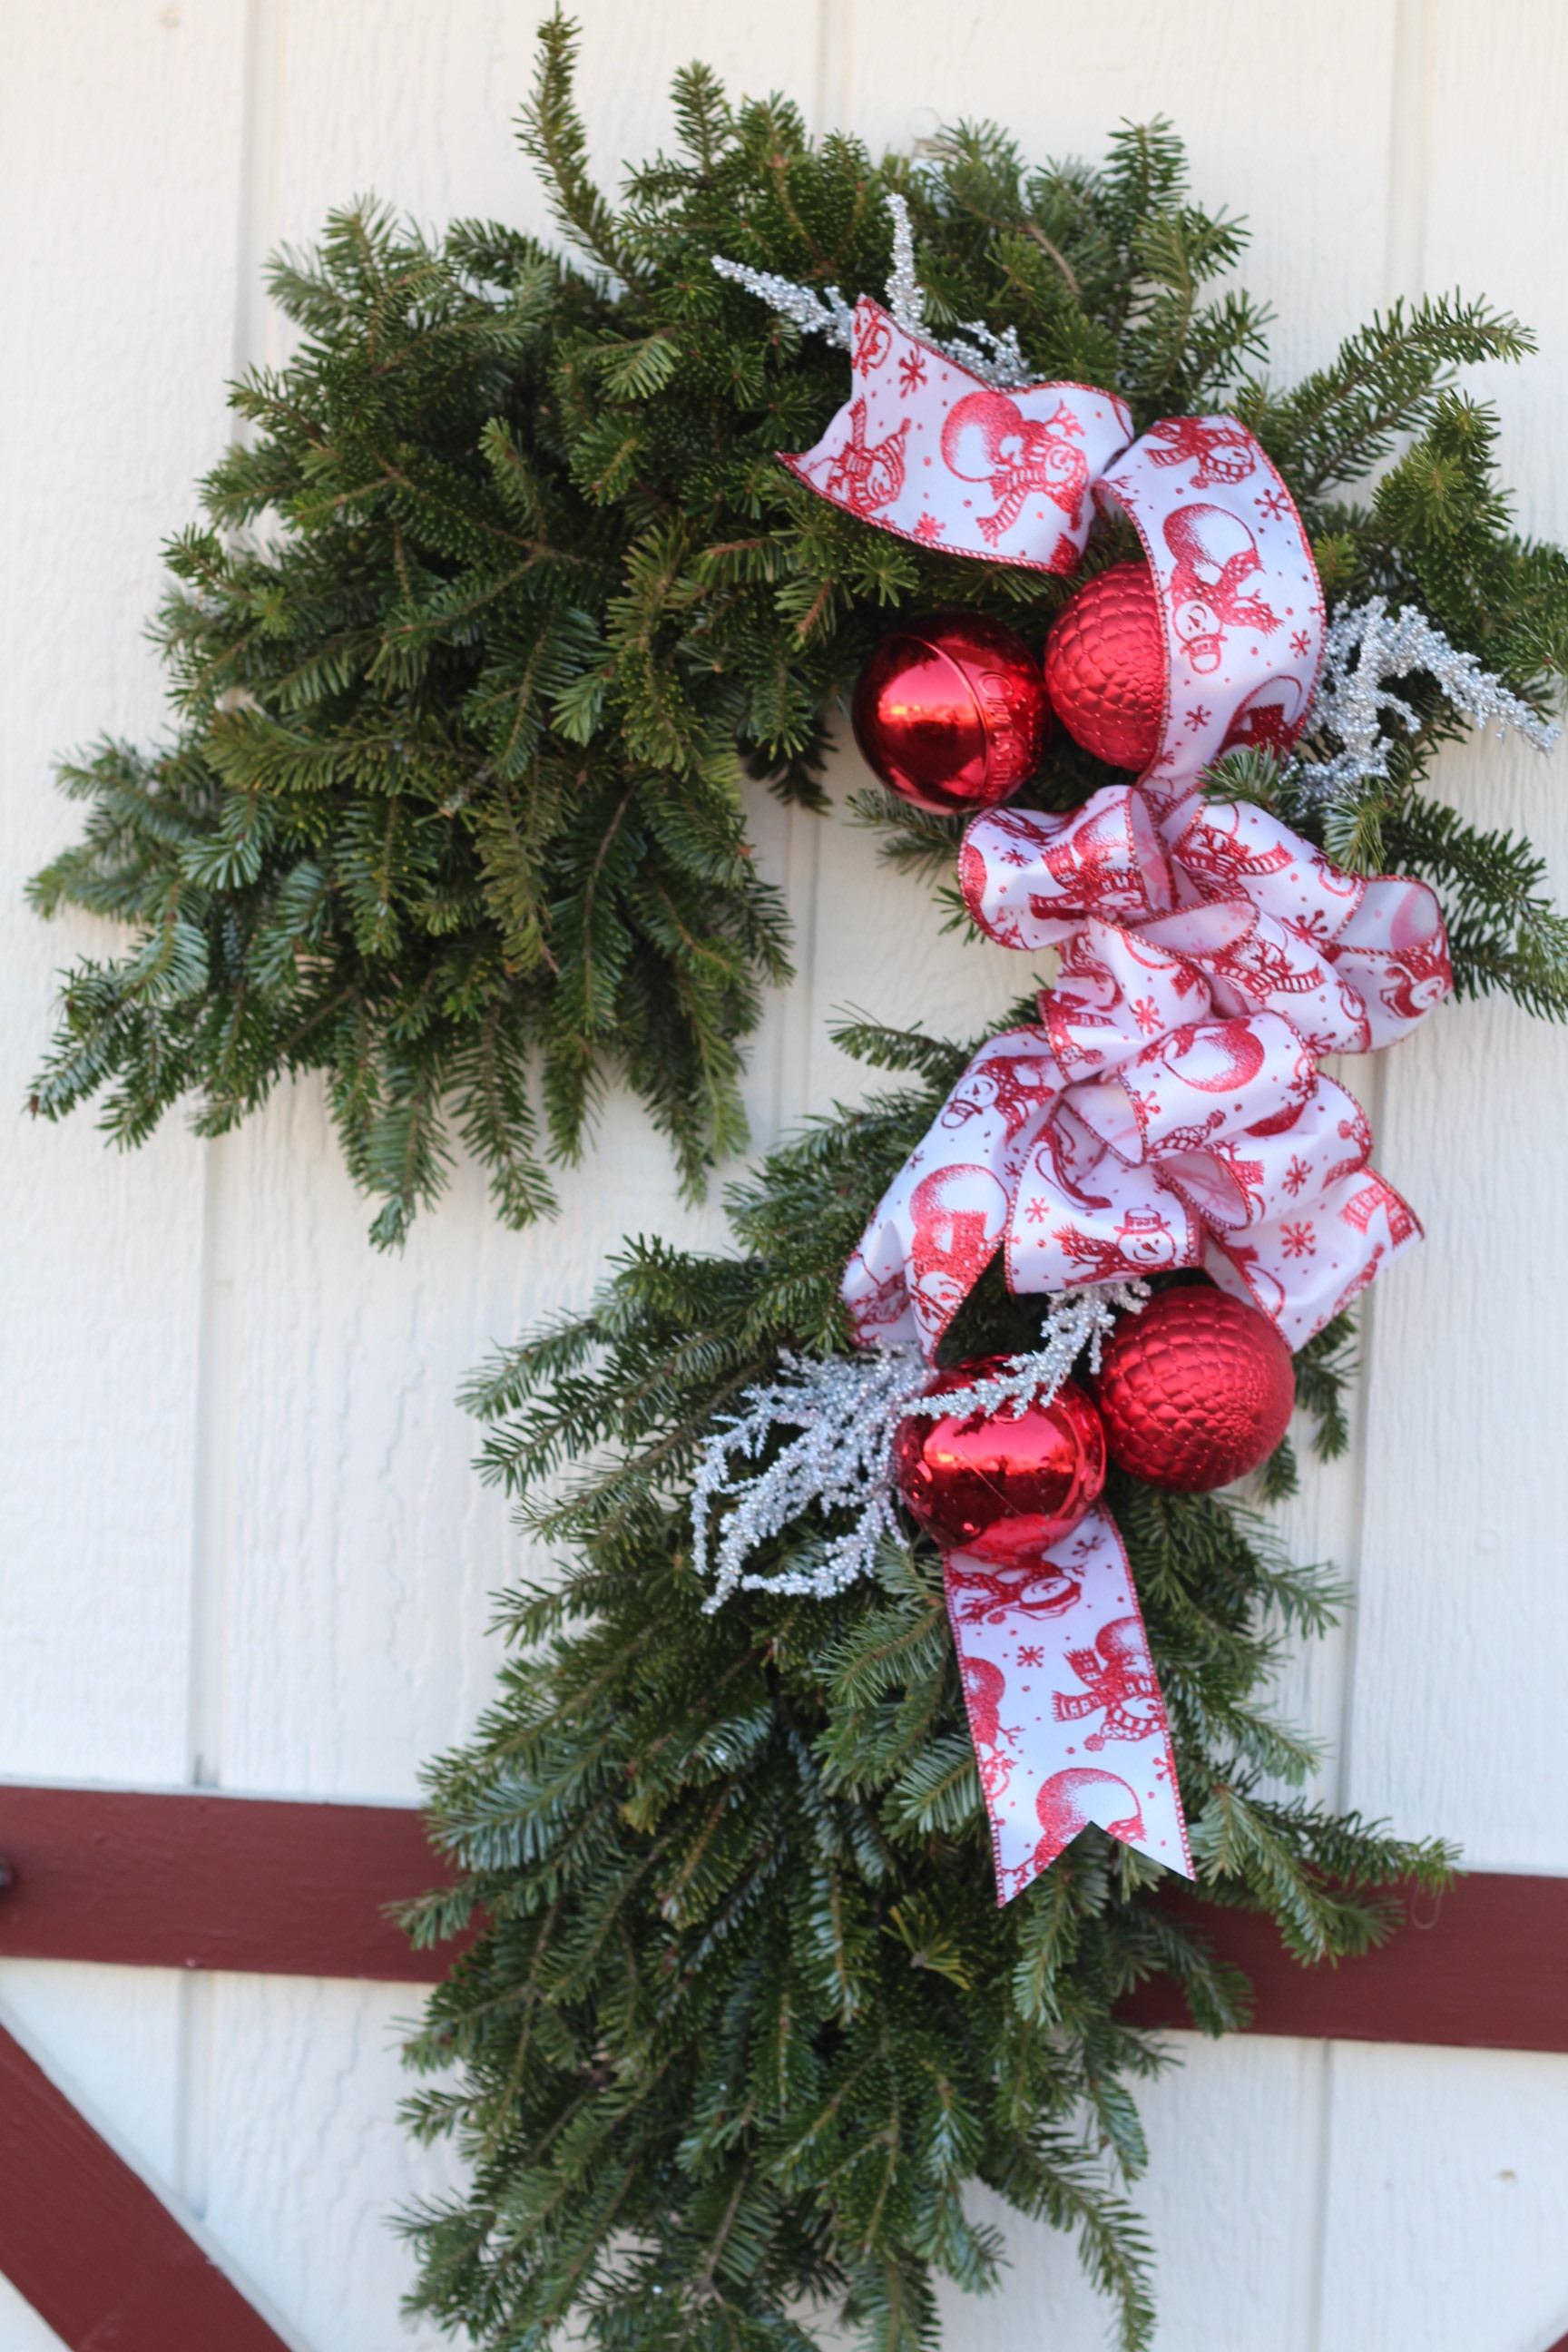 CC-Candy Cane with snowman bow.JPG